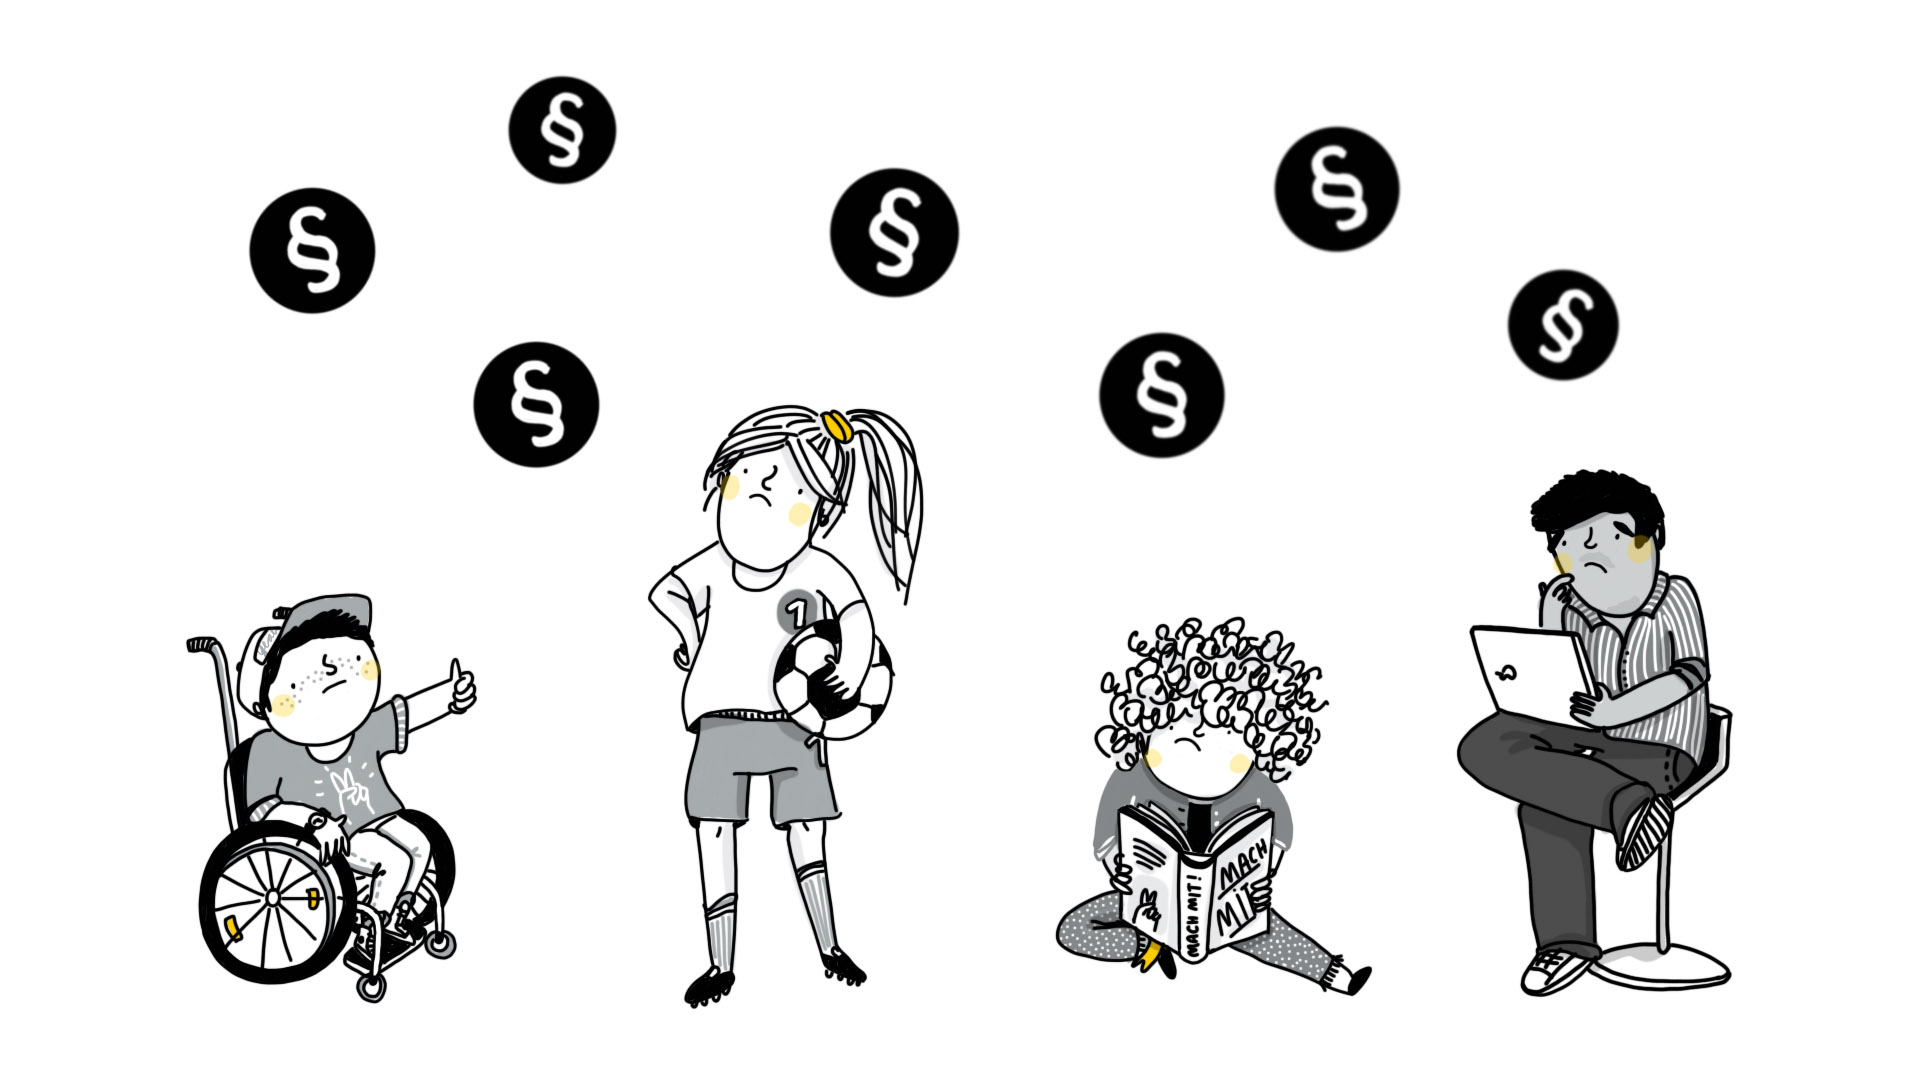 02_FINAL_PK_komjc_illustrationen_frolleinmotte_feb07.jpg